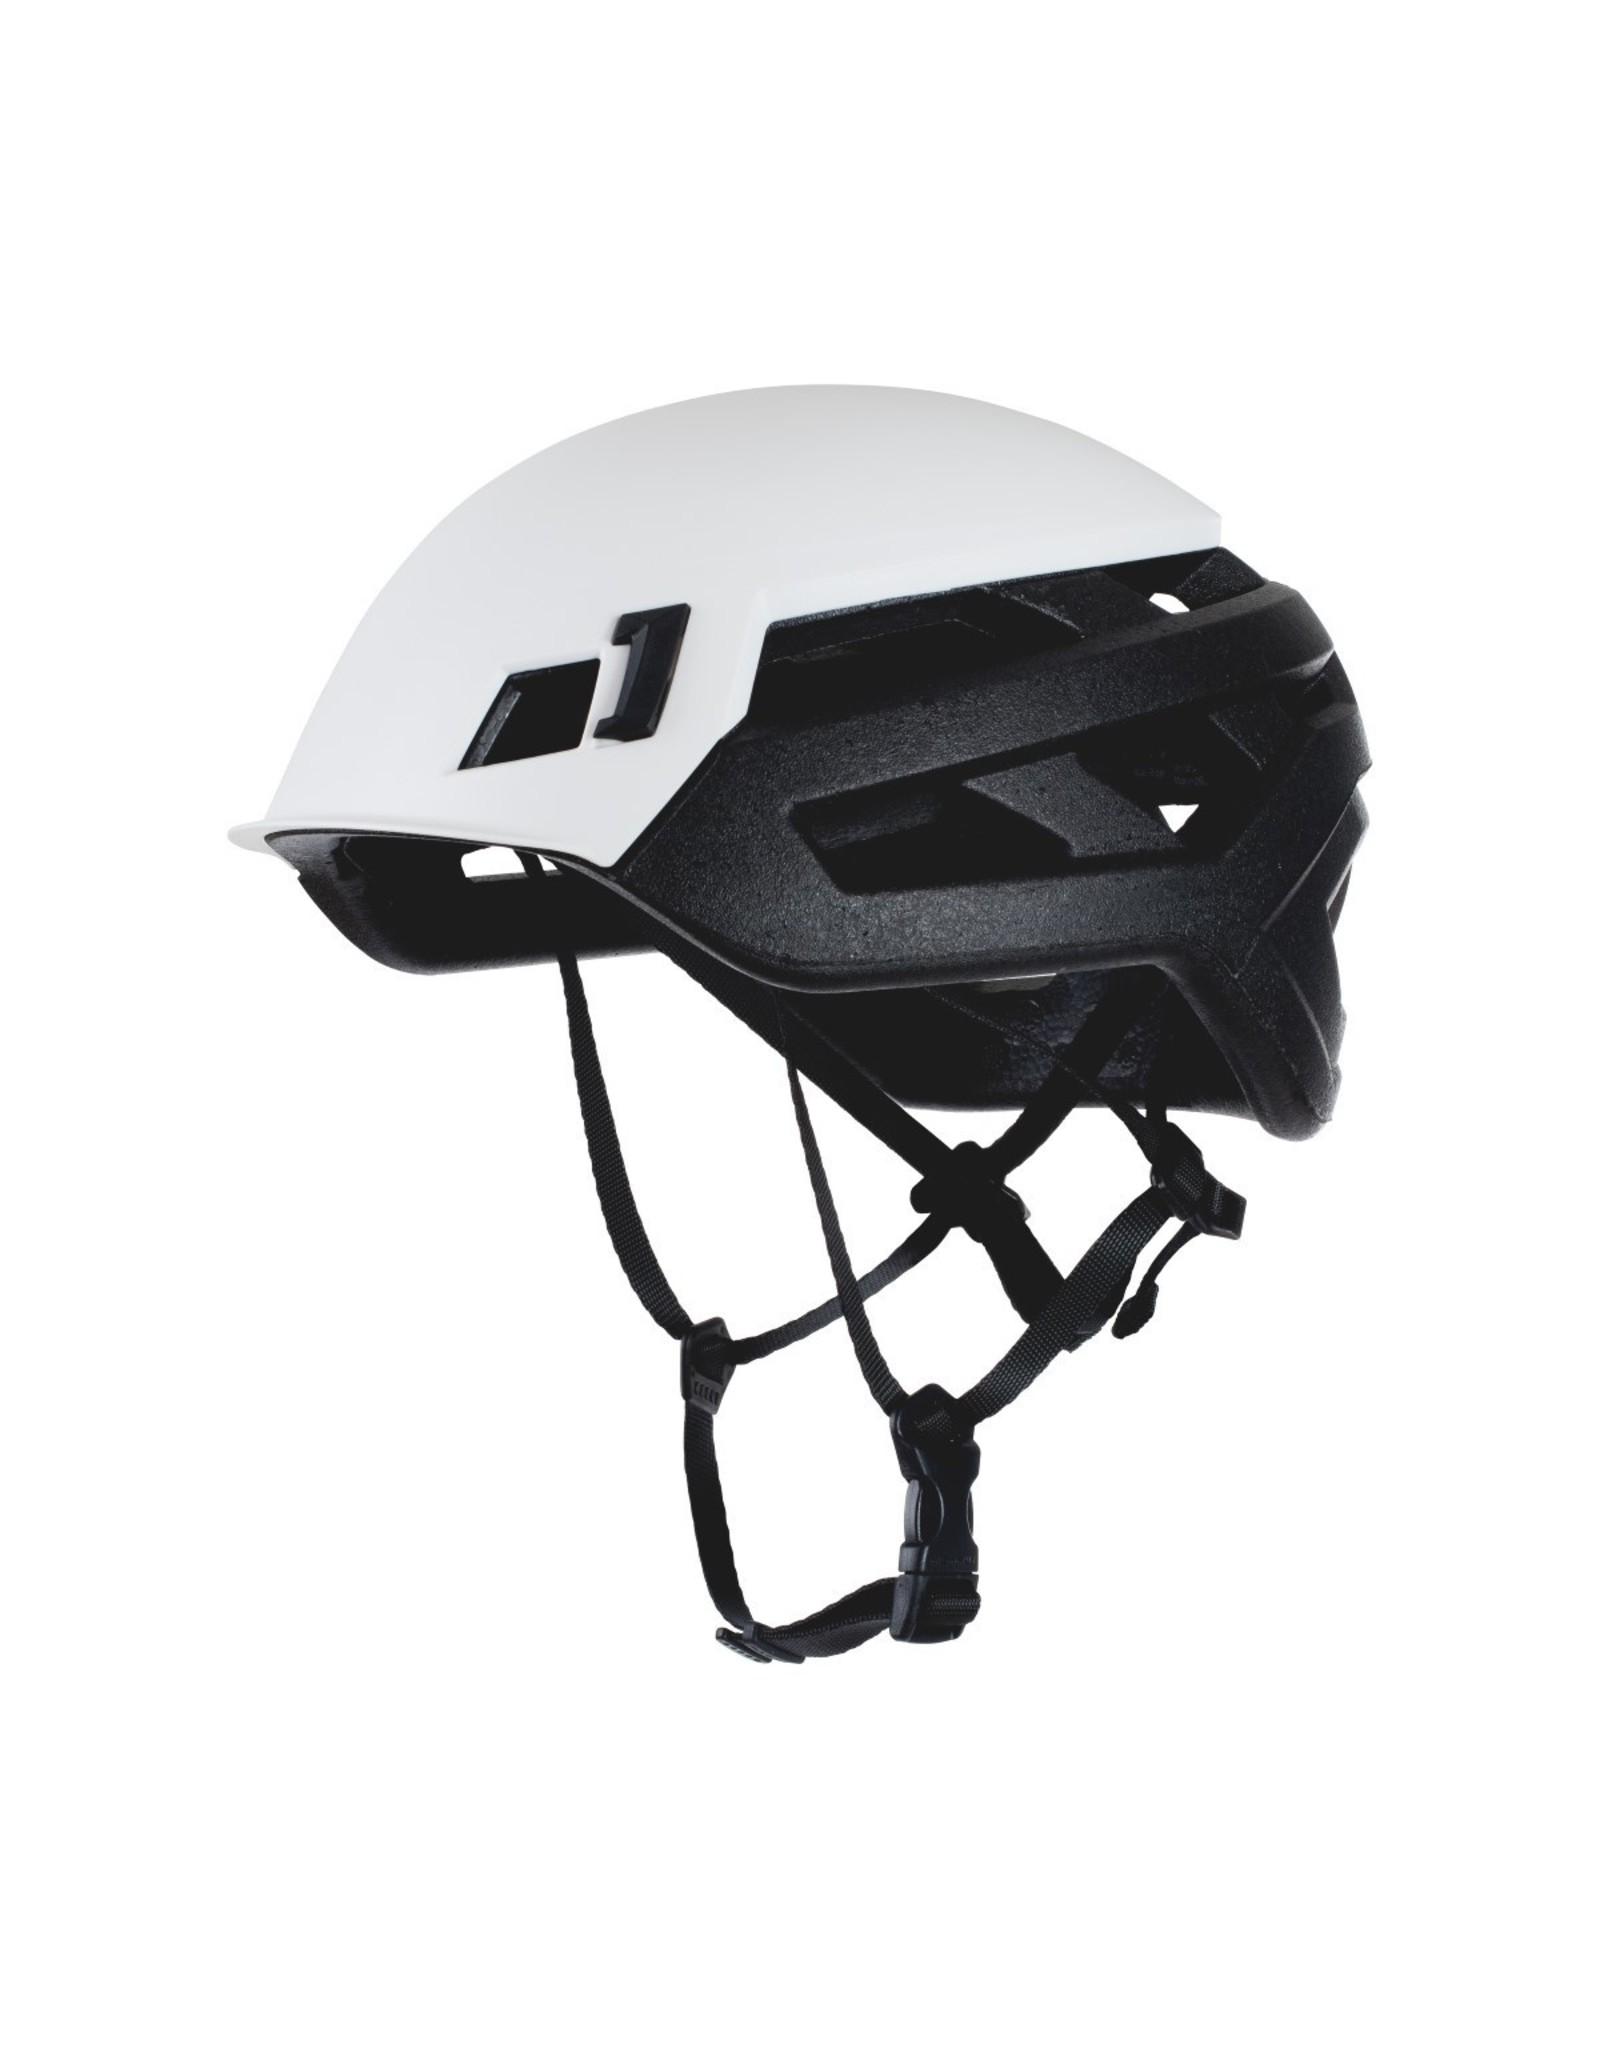 Mammut Mammut Wall Rider Helmet - Unisex